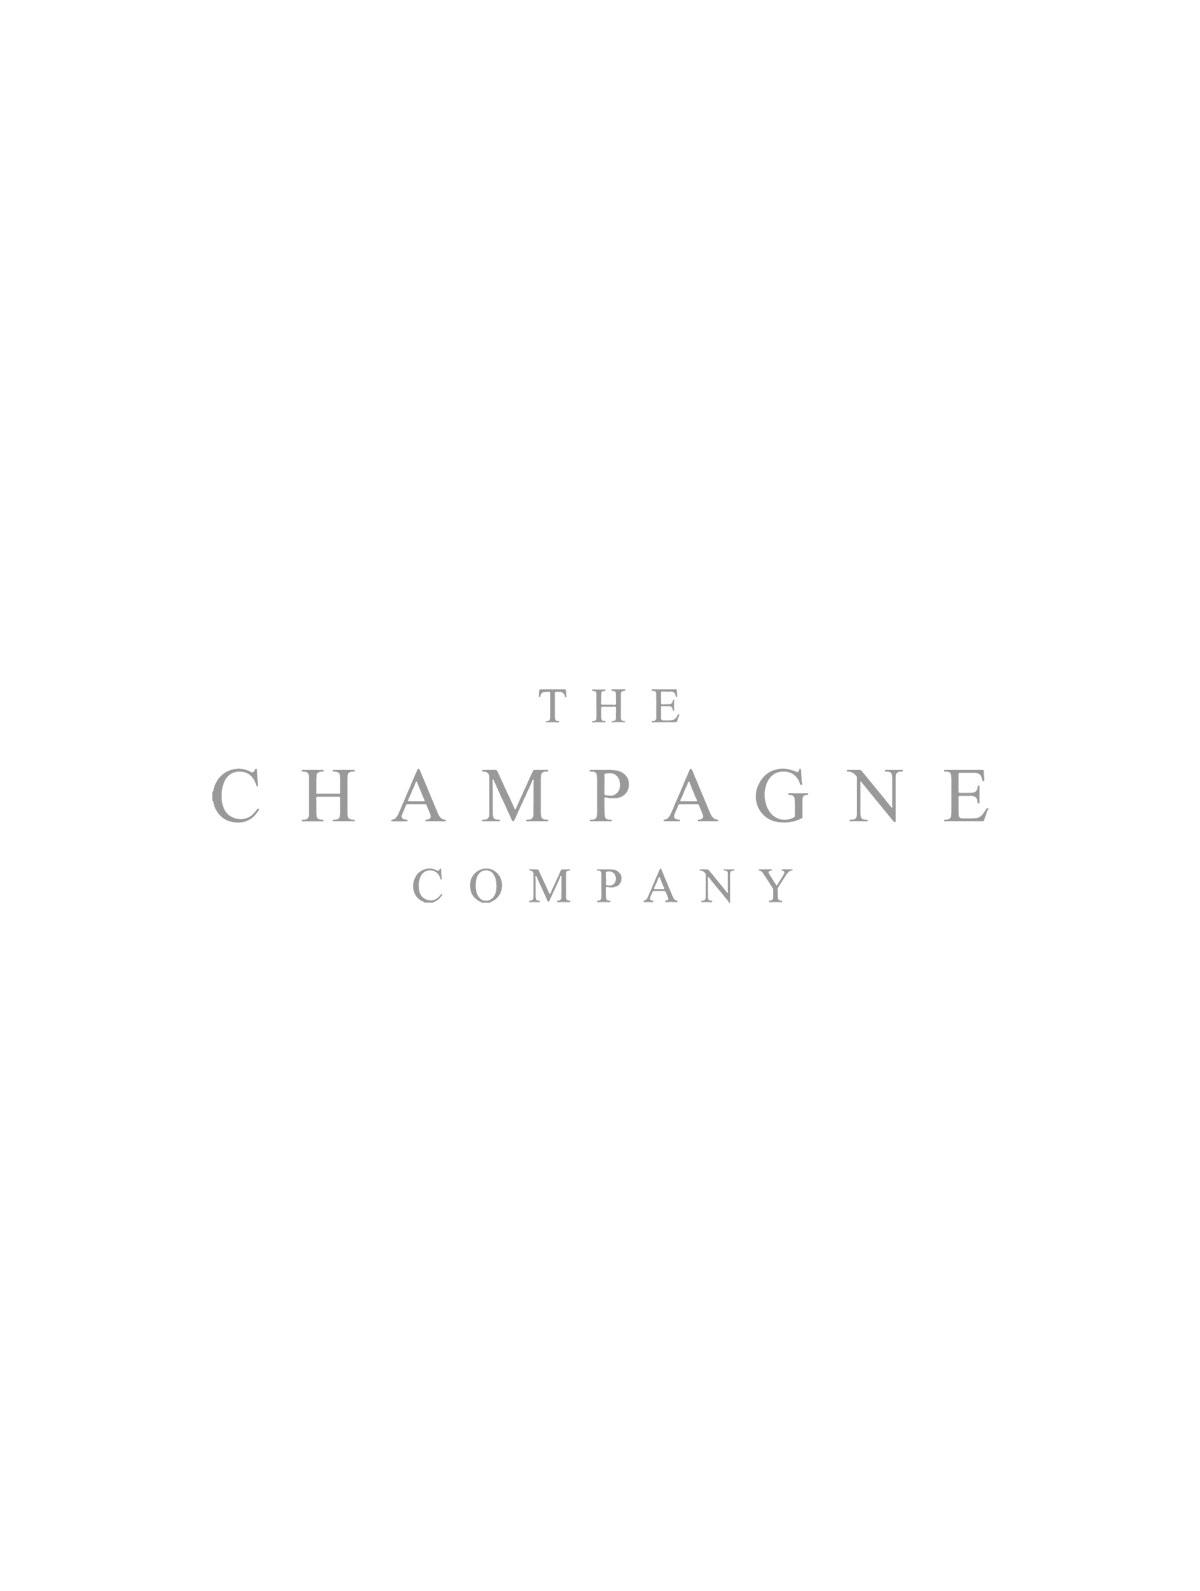 Laurent Perrier Rose Champagne Cuvee Brut NV 75cl & Pink Truffles 275g